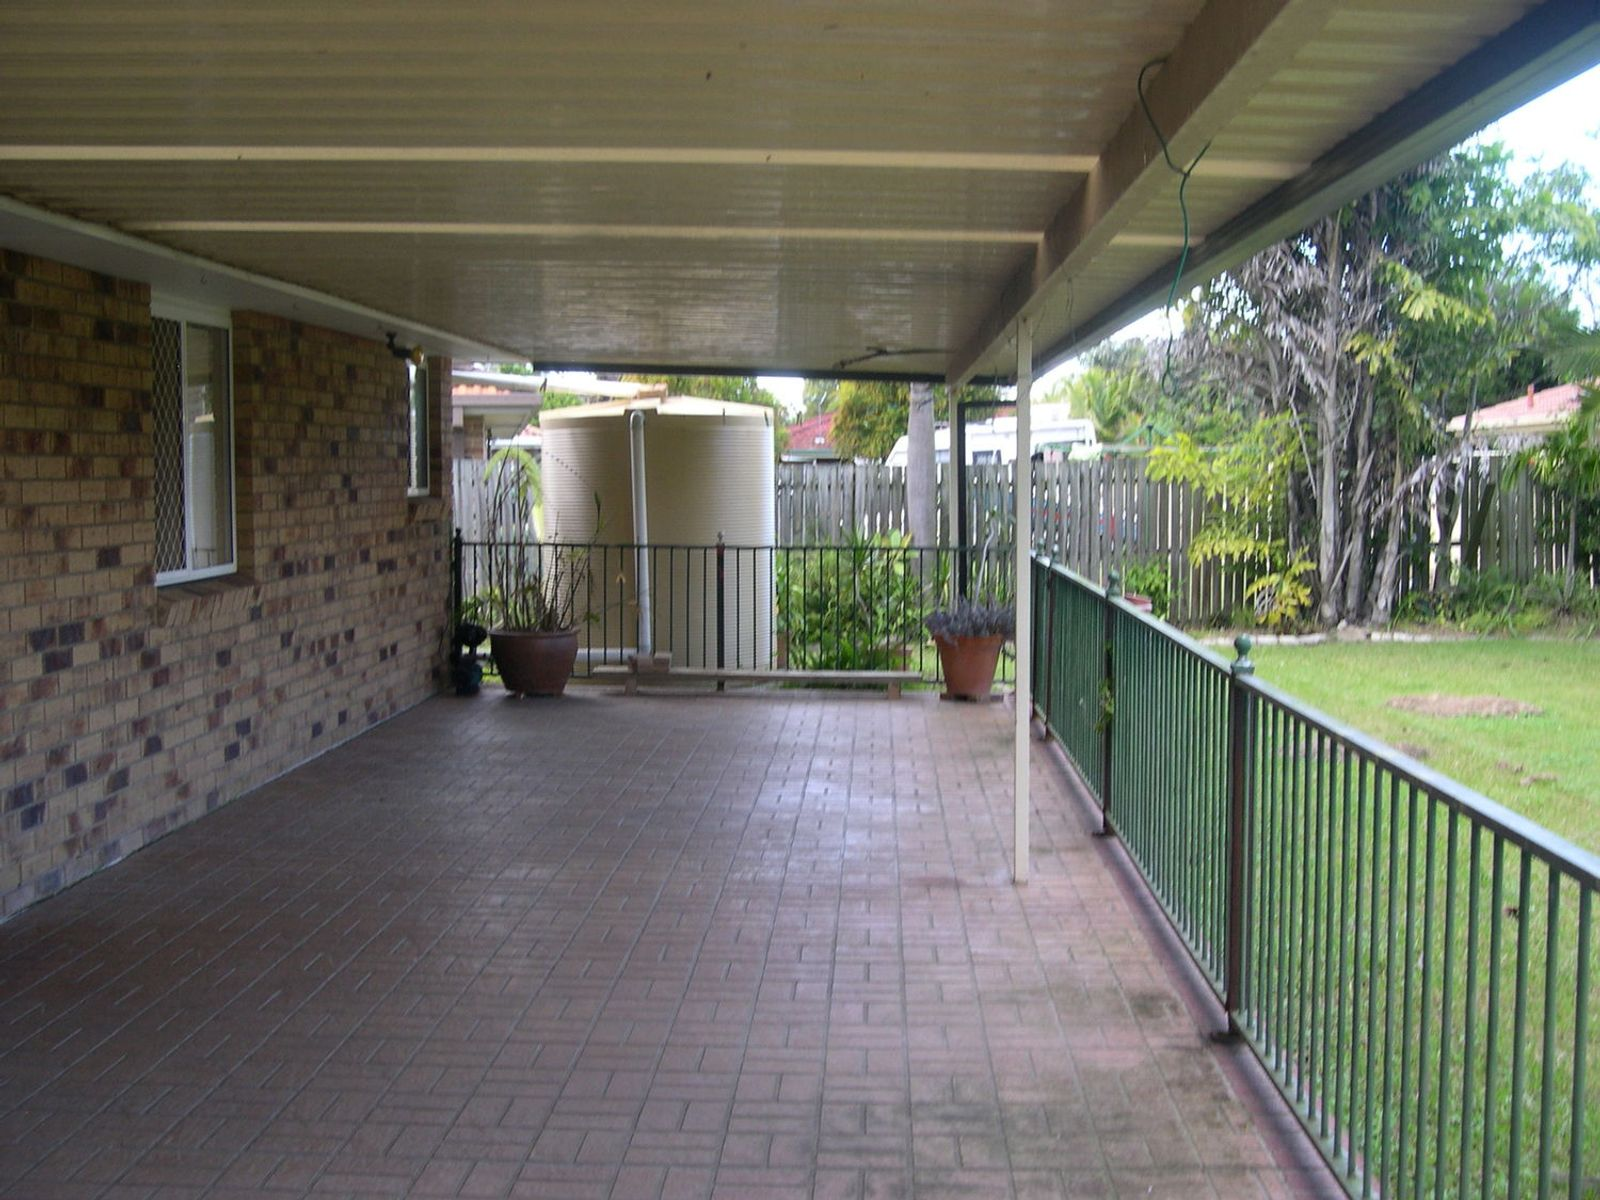 11 Aegean Street, Waterford West, QLD 4133